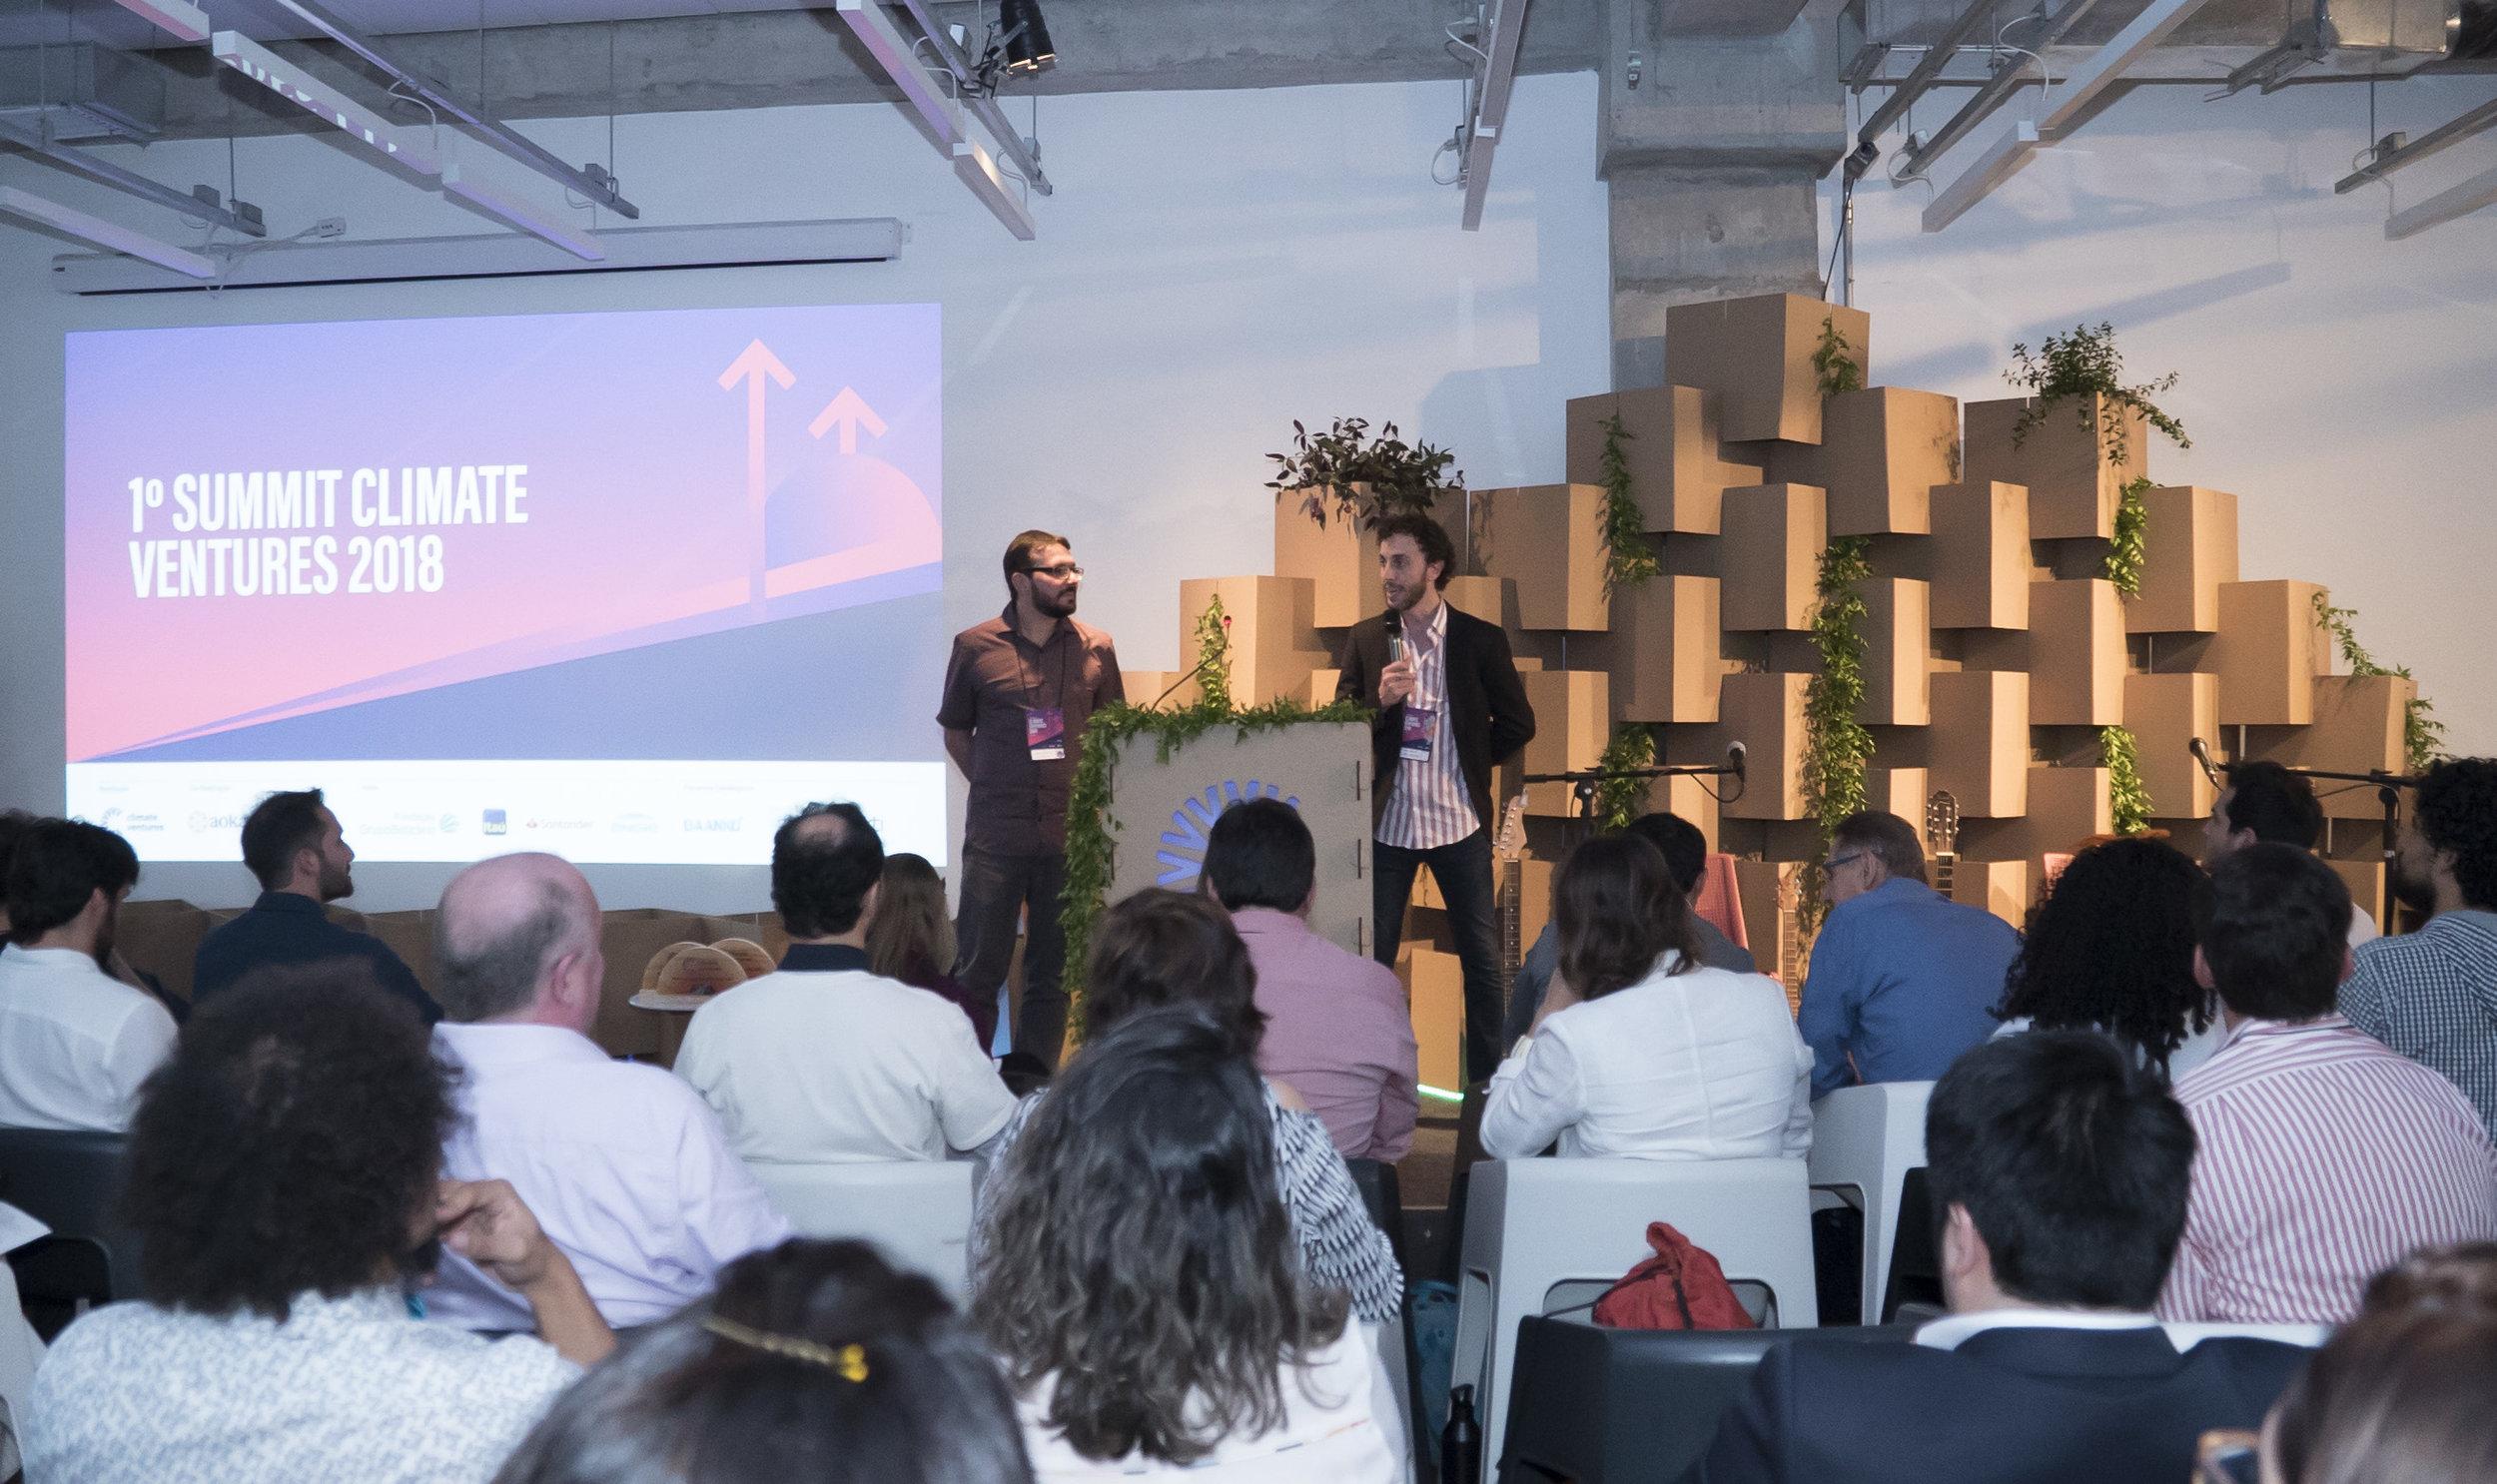 Ricardo Gravina and Daniel Contrucci from Climate Ventures.